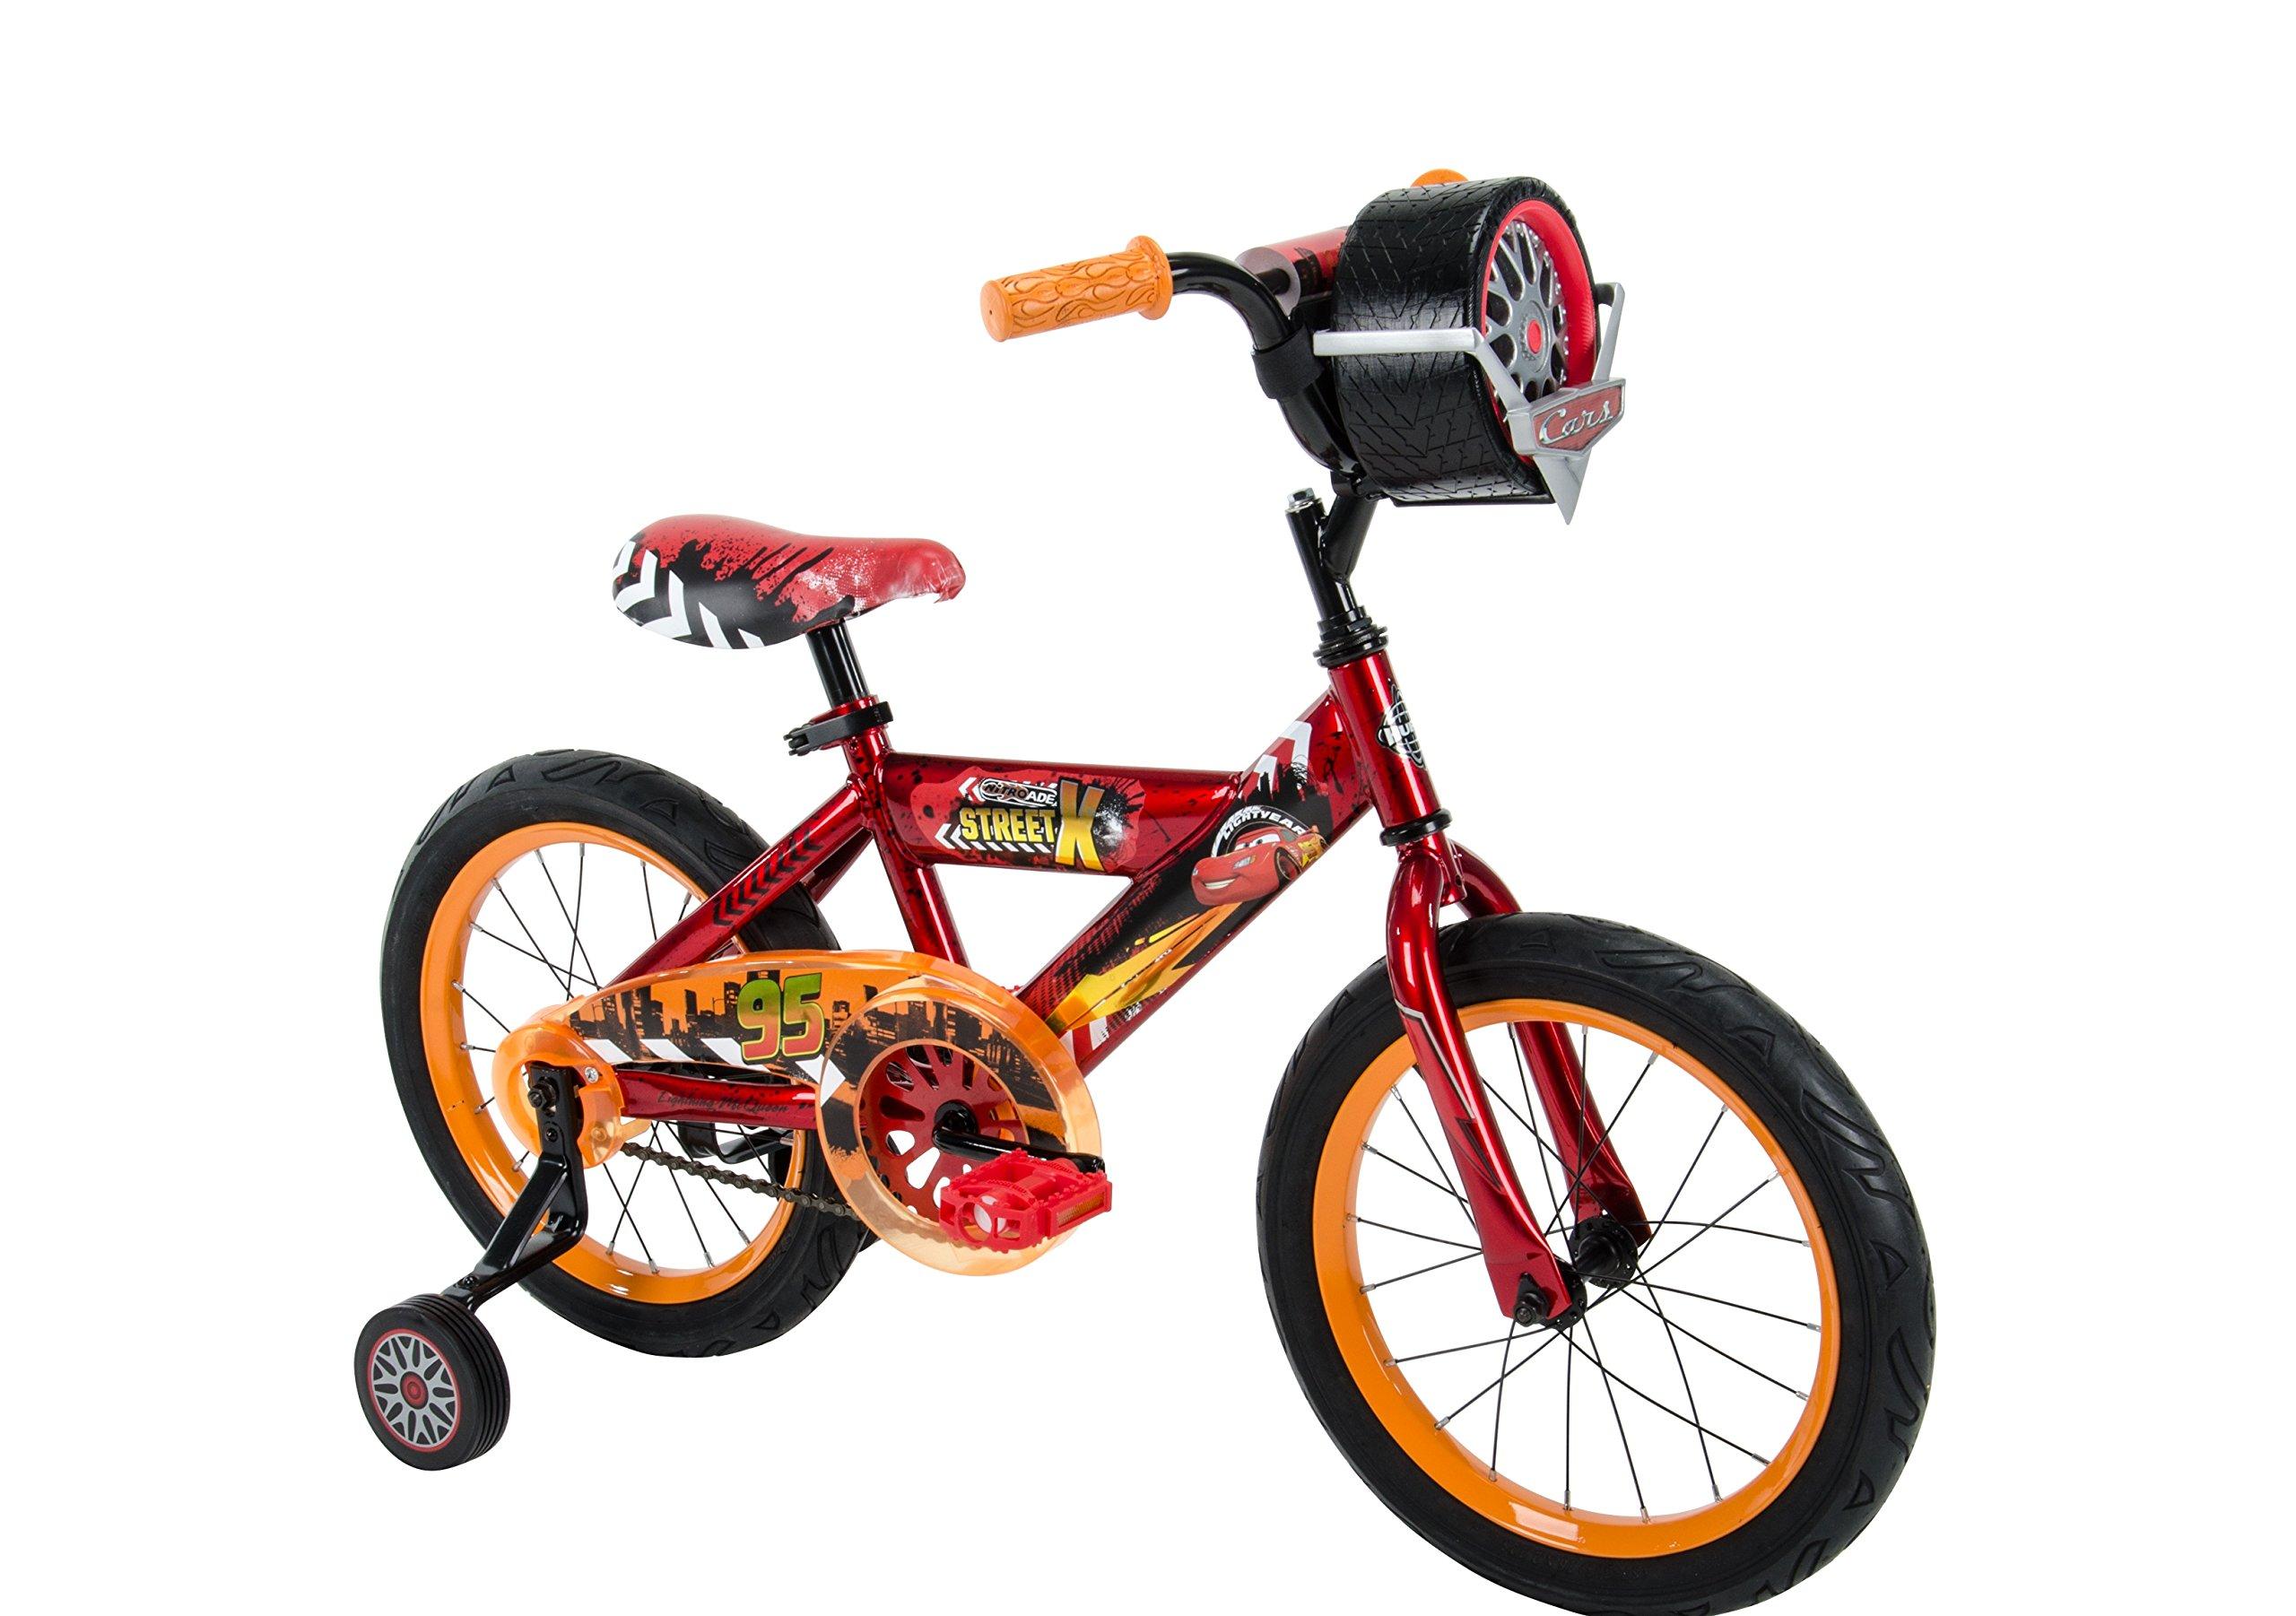 Huffy 16'' Disney Pixar Cars 3 Bike by